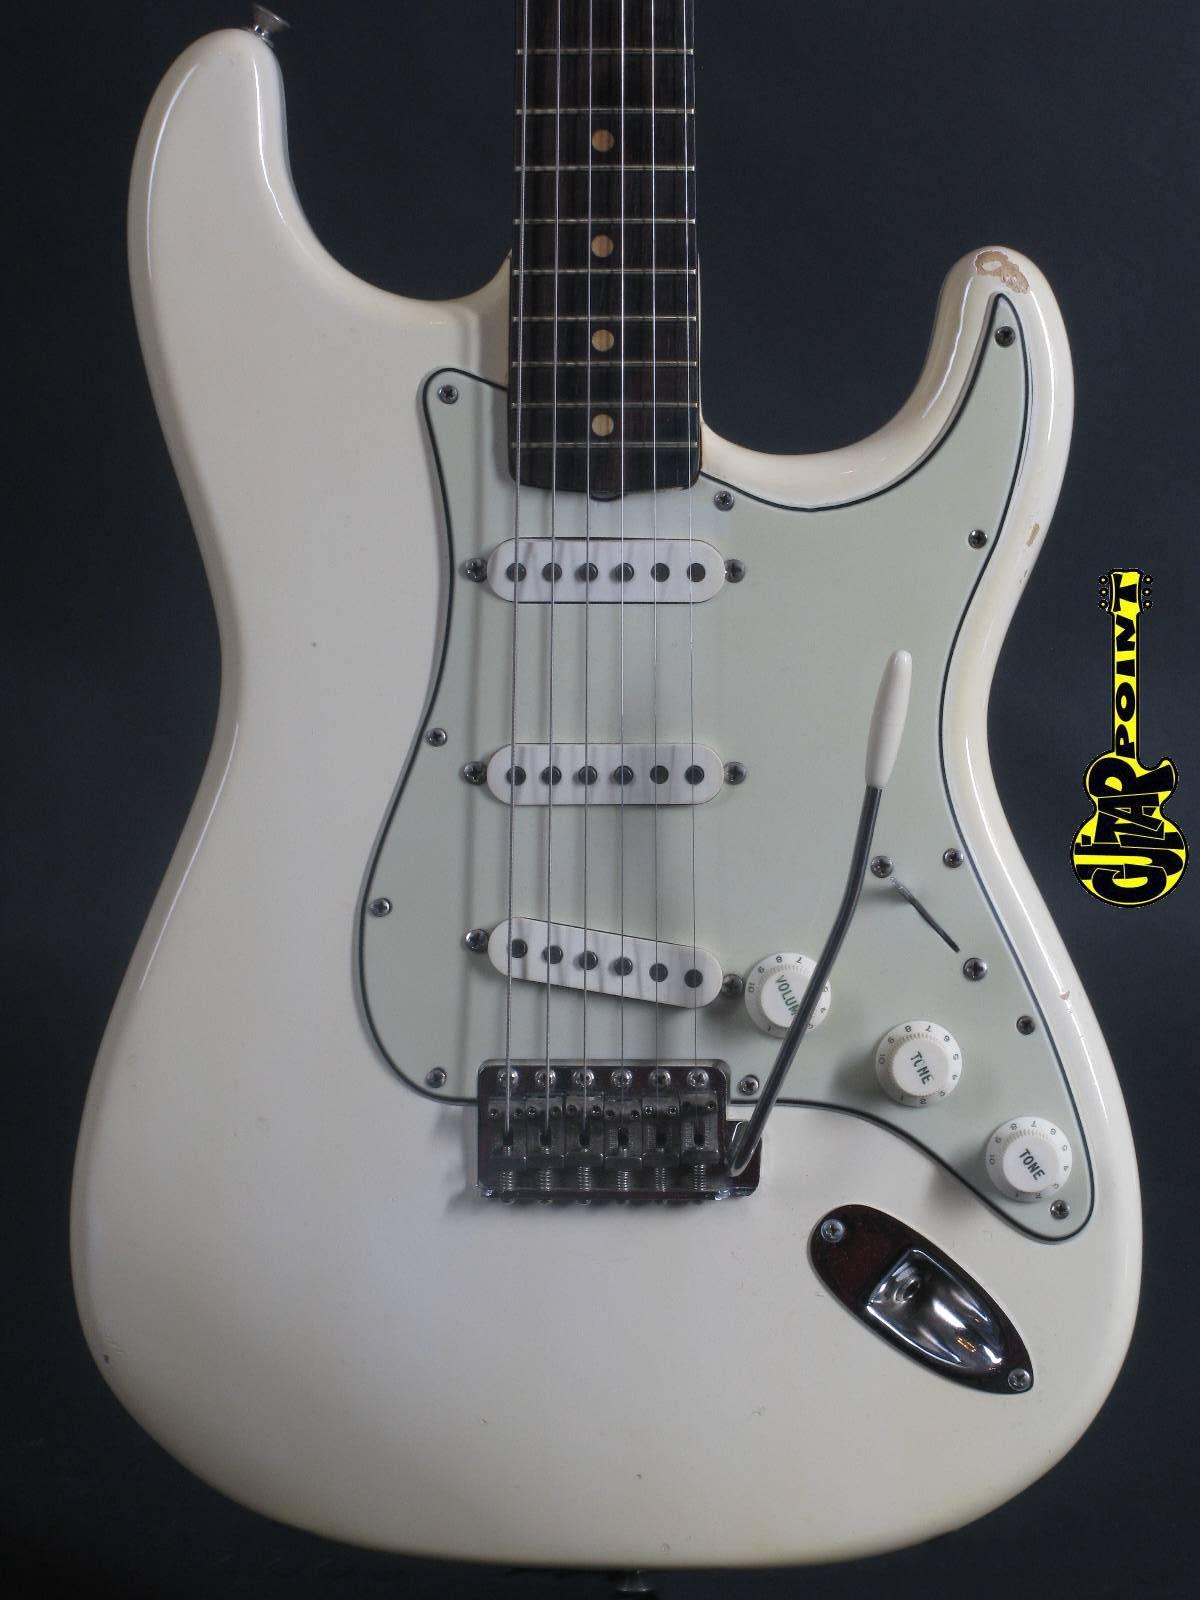 1964 Fender Stratocaster - Olympic White / Ash Body!